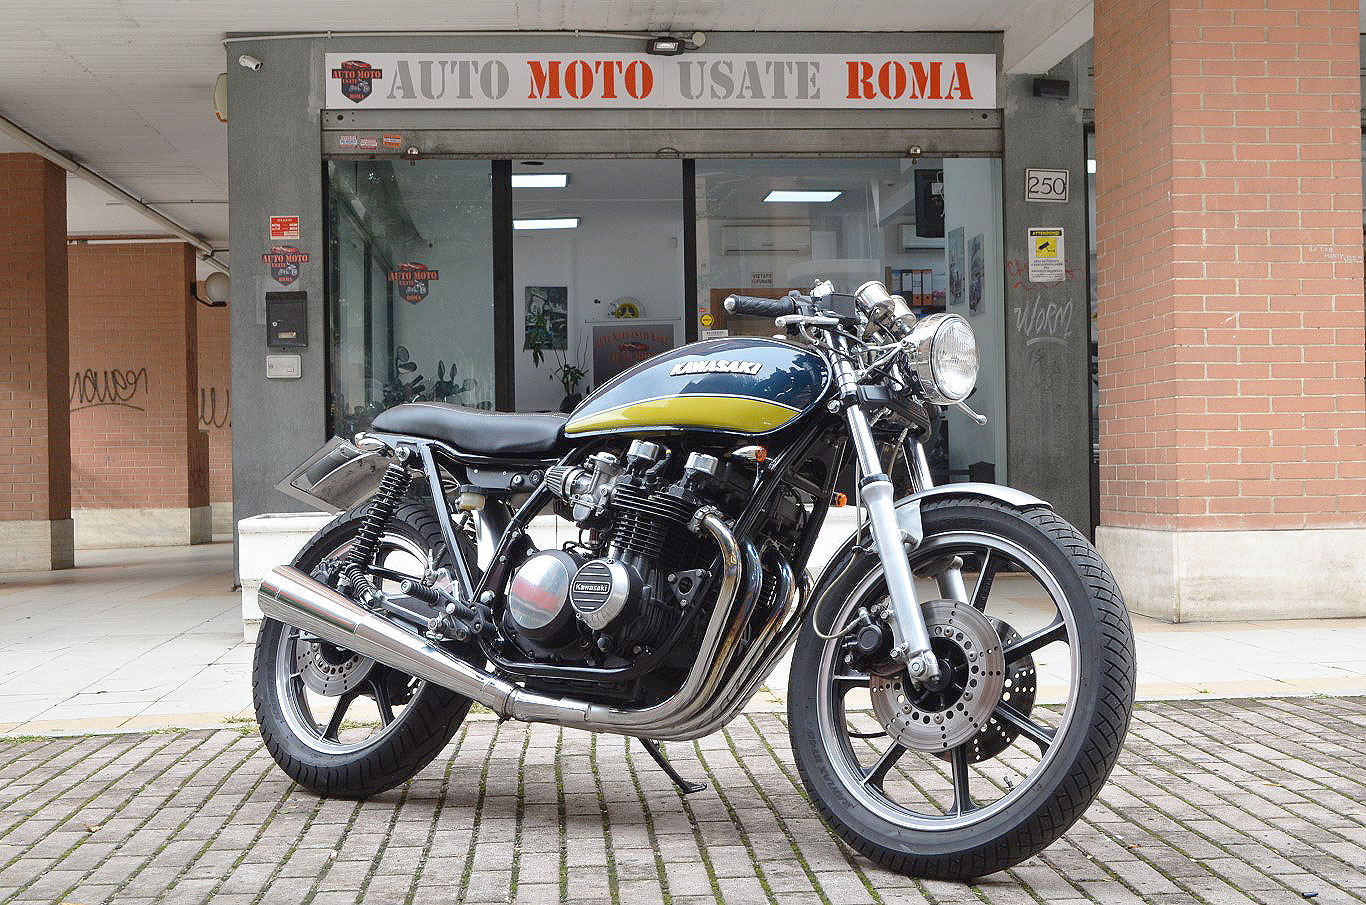 Bmw Cafe Racer Usata Roma Newmotorjdico